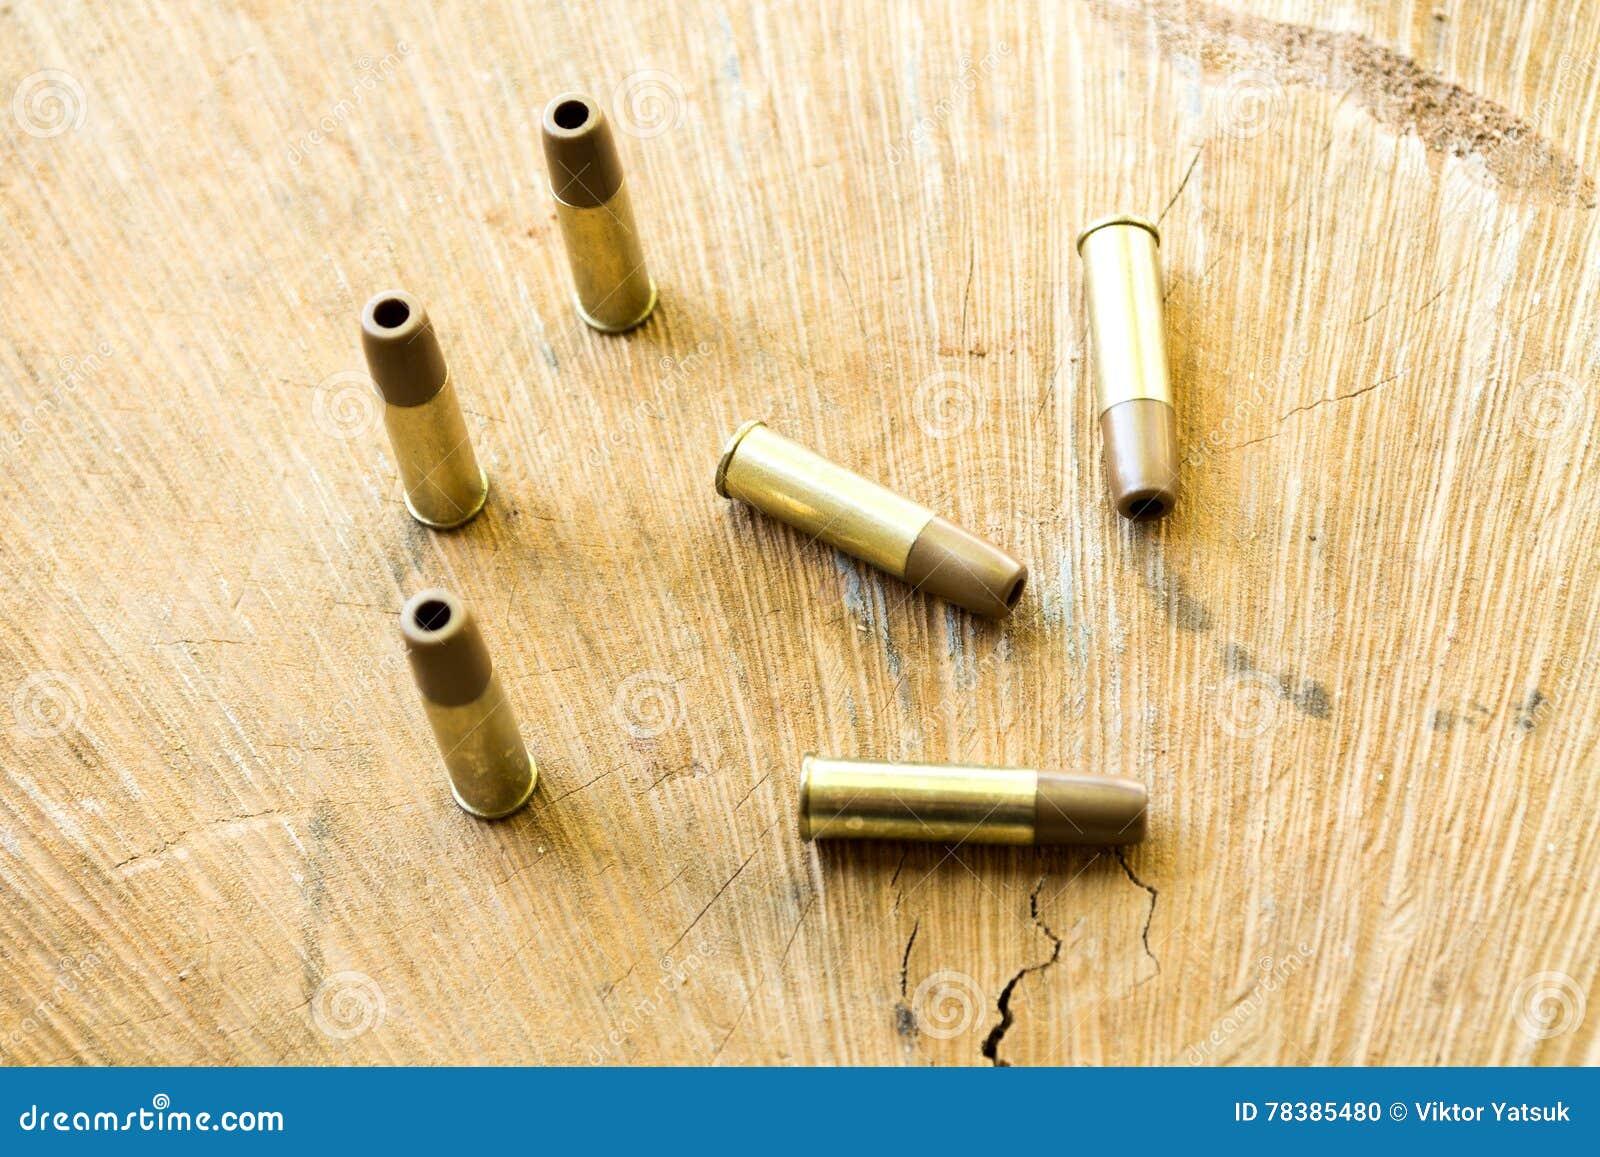 Bullets  Pneumatic  Air Gun  Stock Photo - Image of group